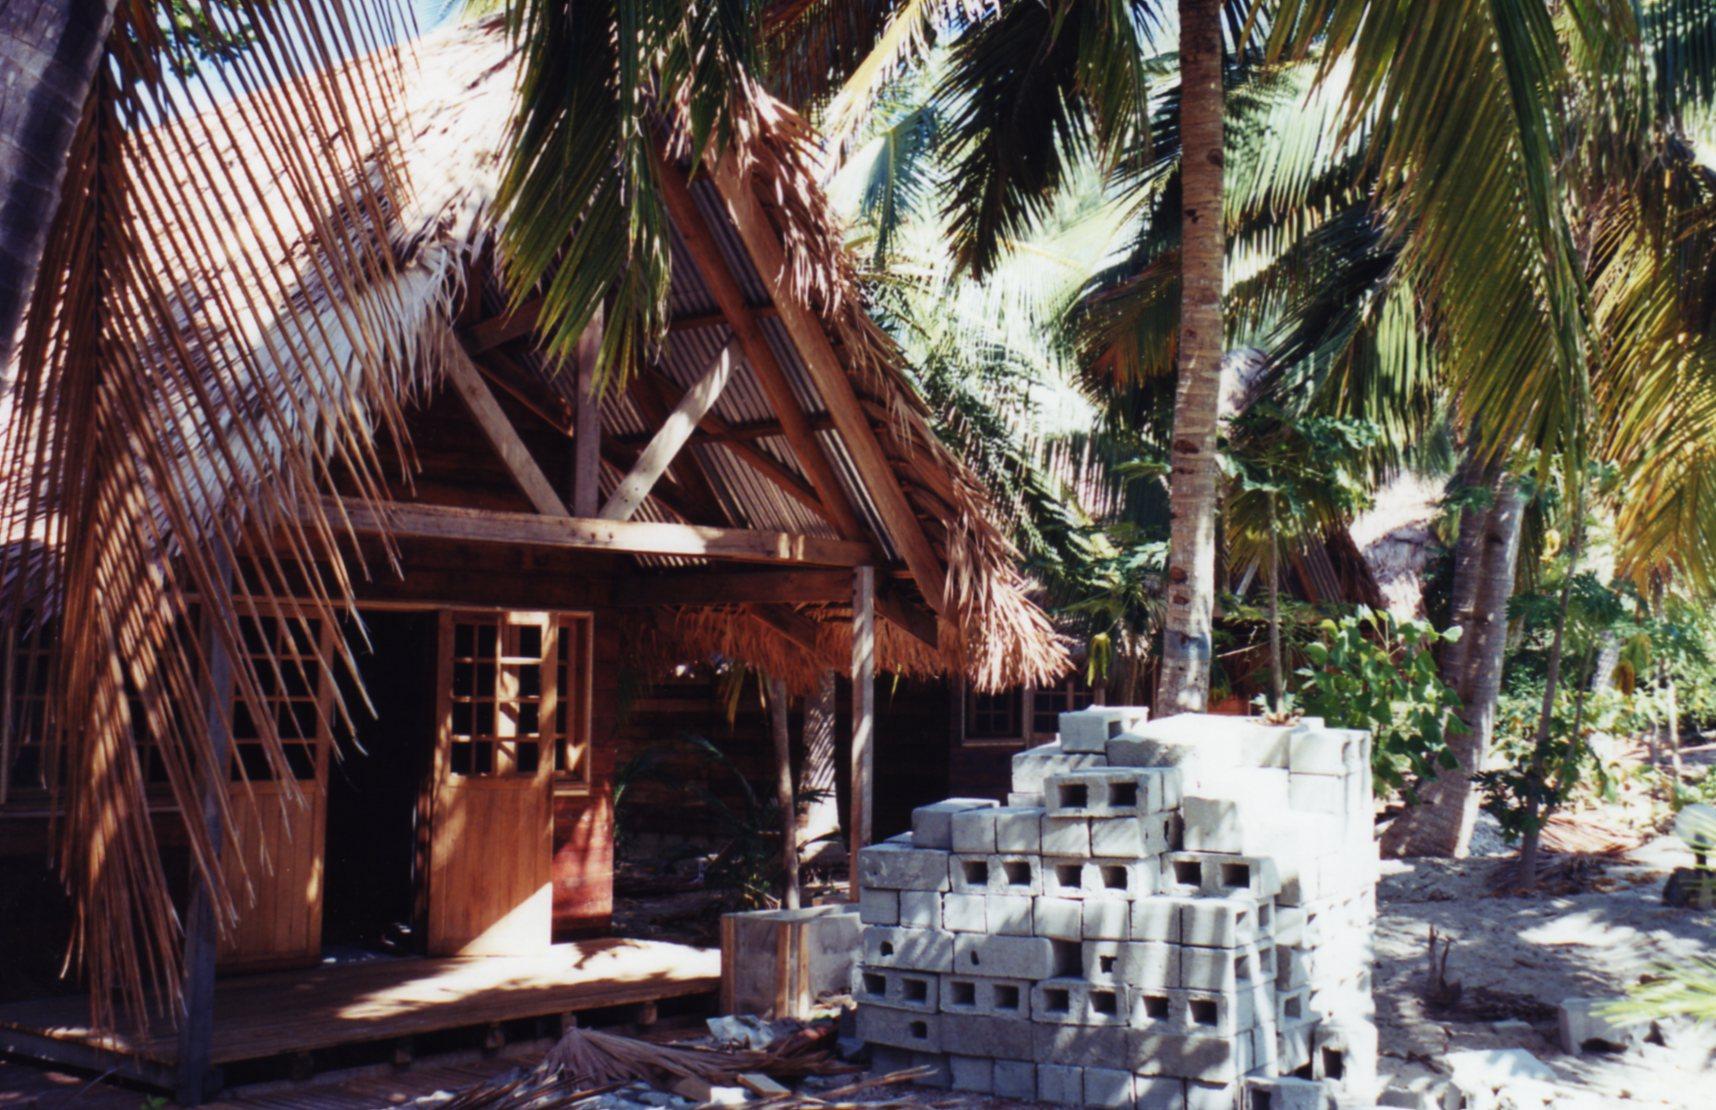 Building chalets